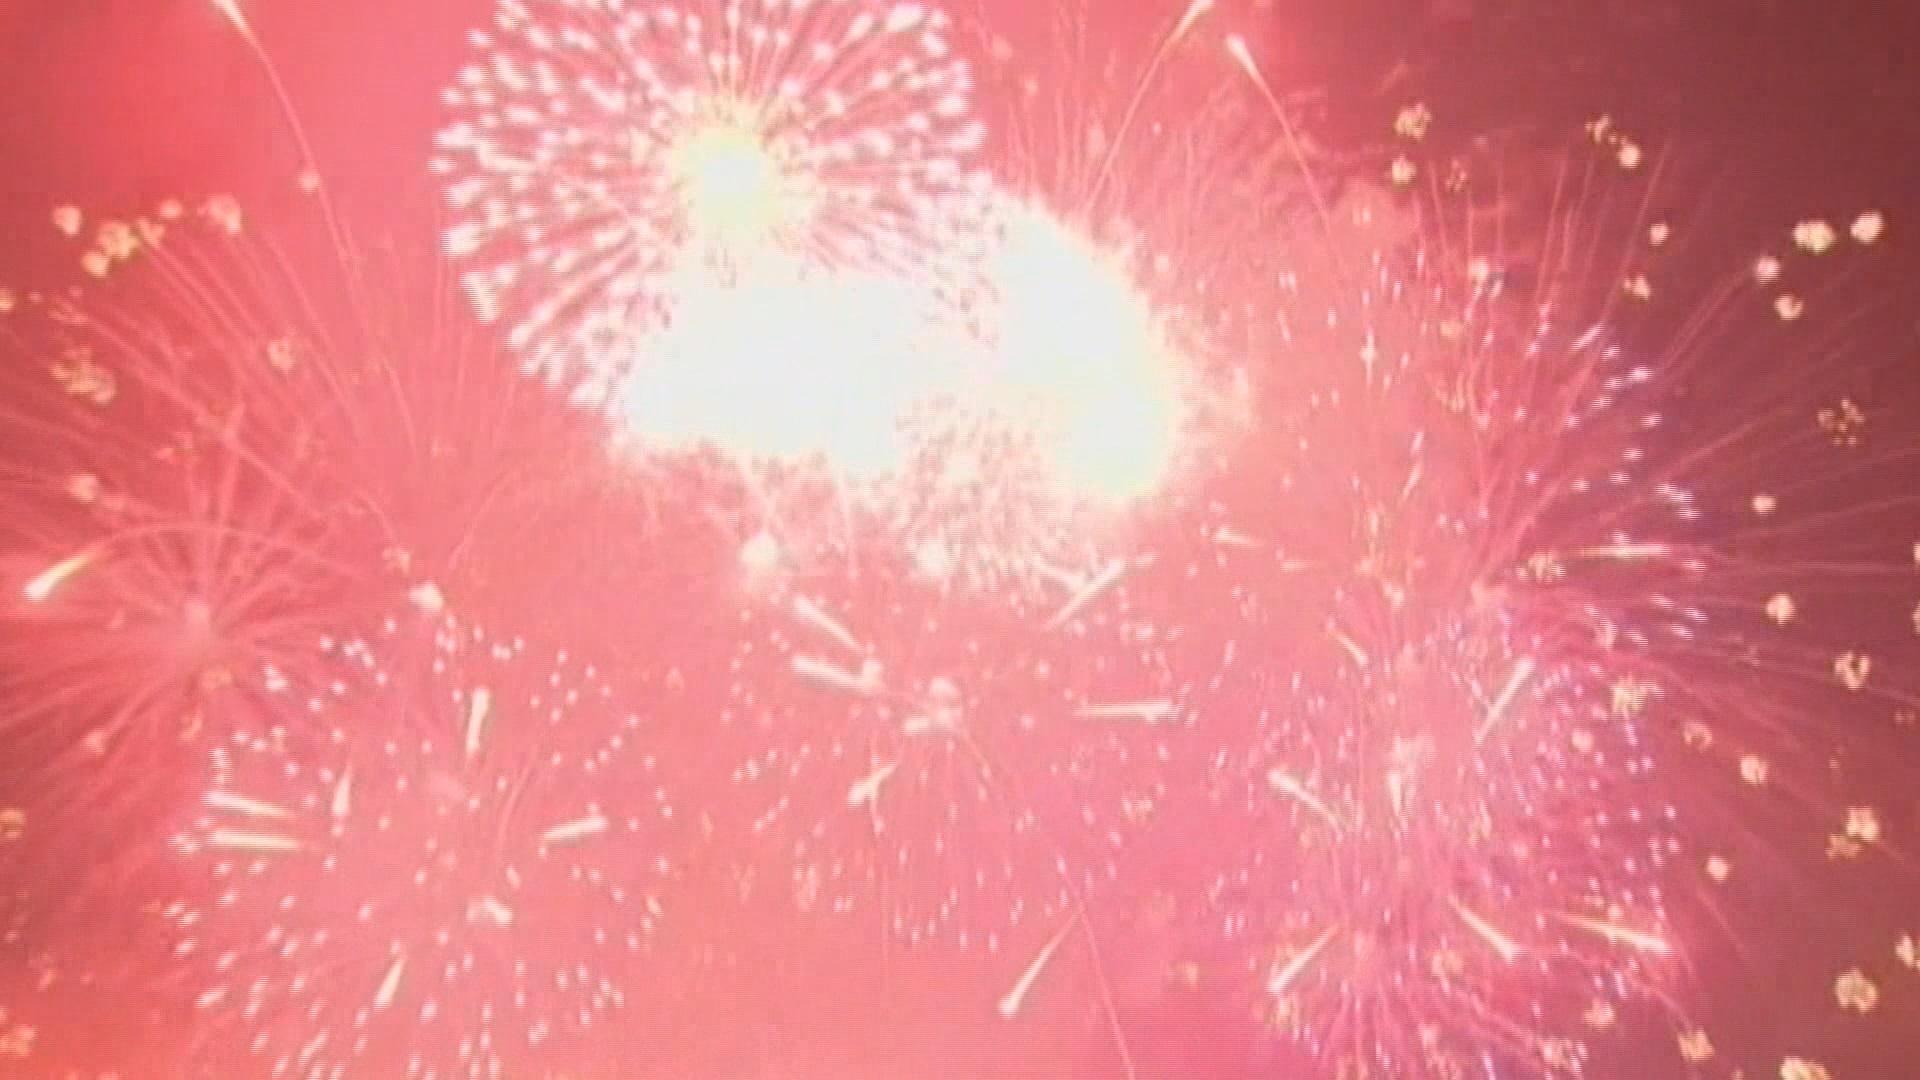 dayton_fireworks_1530609840079.jpg